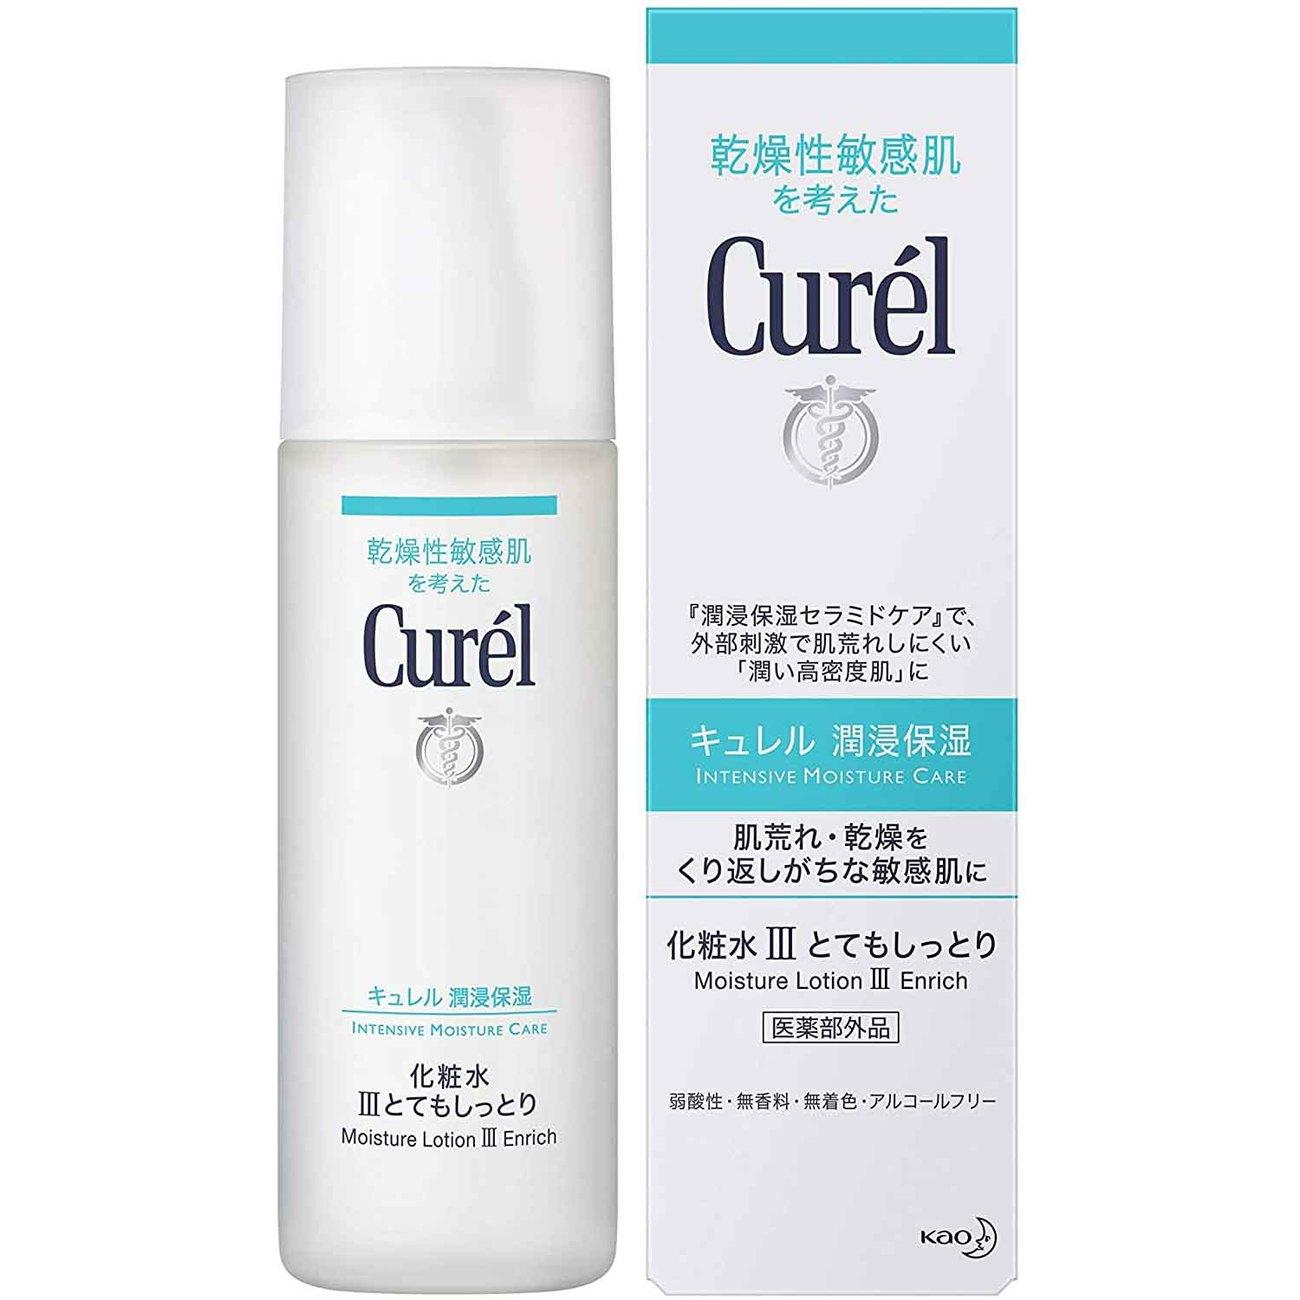 Curel(キュレル) 化粧水 III とてもしっとり